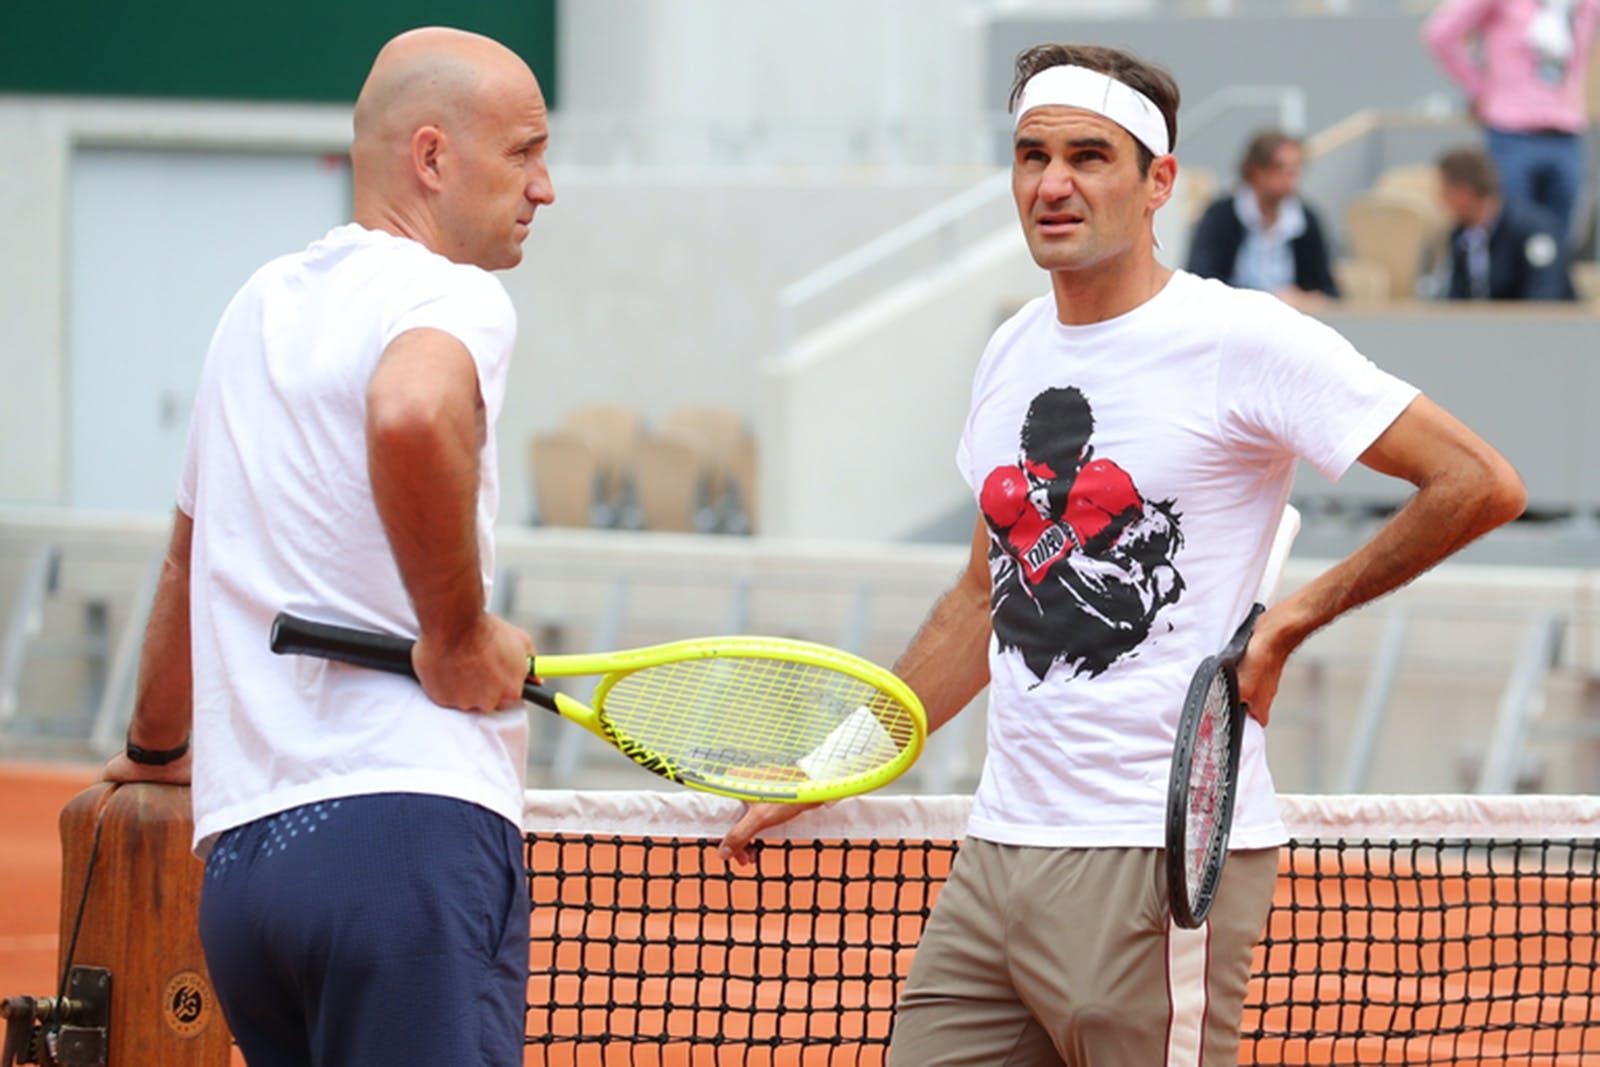 Roger Federer and coach Ivan Ljubicic at practice